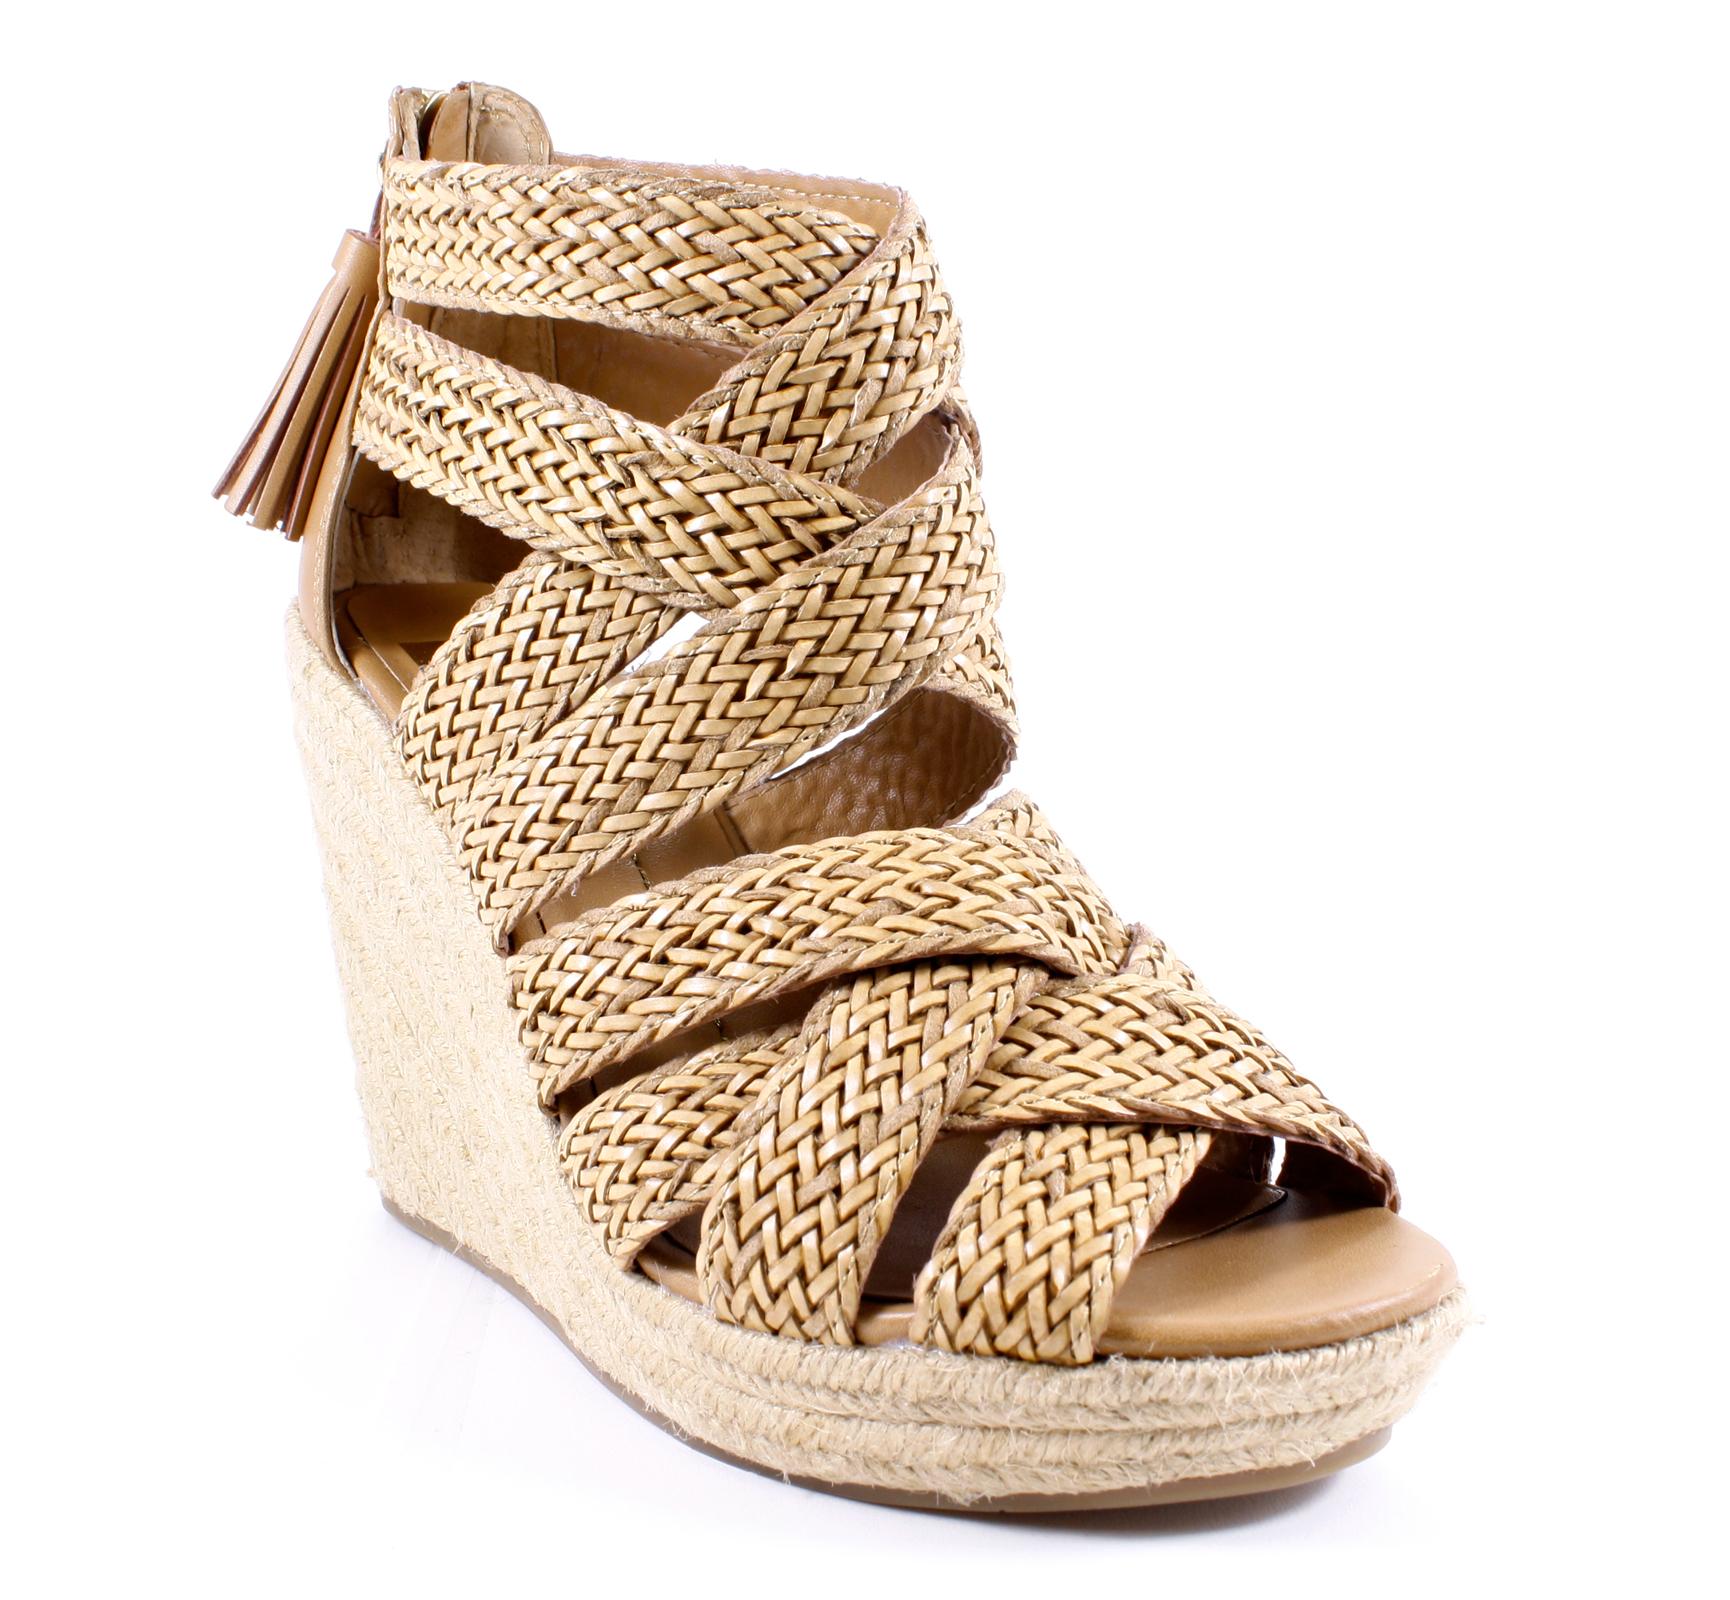 Dv Dolce Vita Tulle Espadrille Wedge Sandals